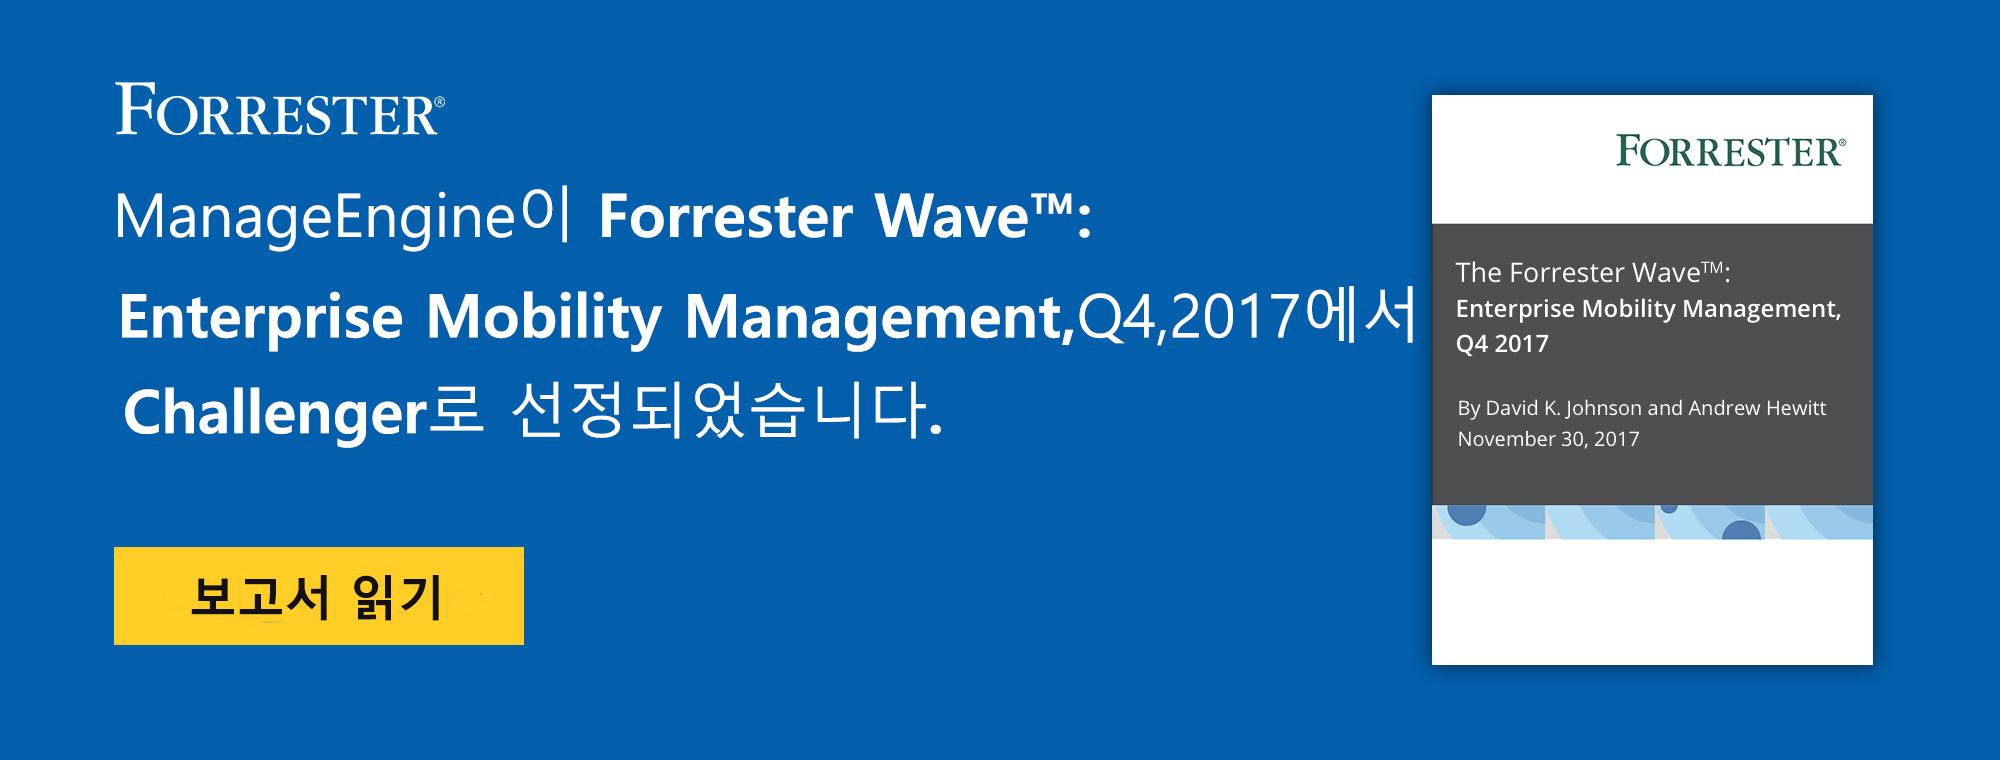 ManageEngine이 Forrester Wave™:Enterprise Mobility Management,Q4,2017에서 Challenger로 선정되었습니다.